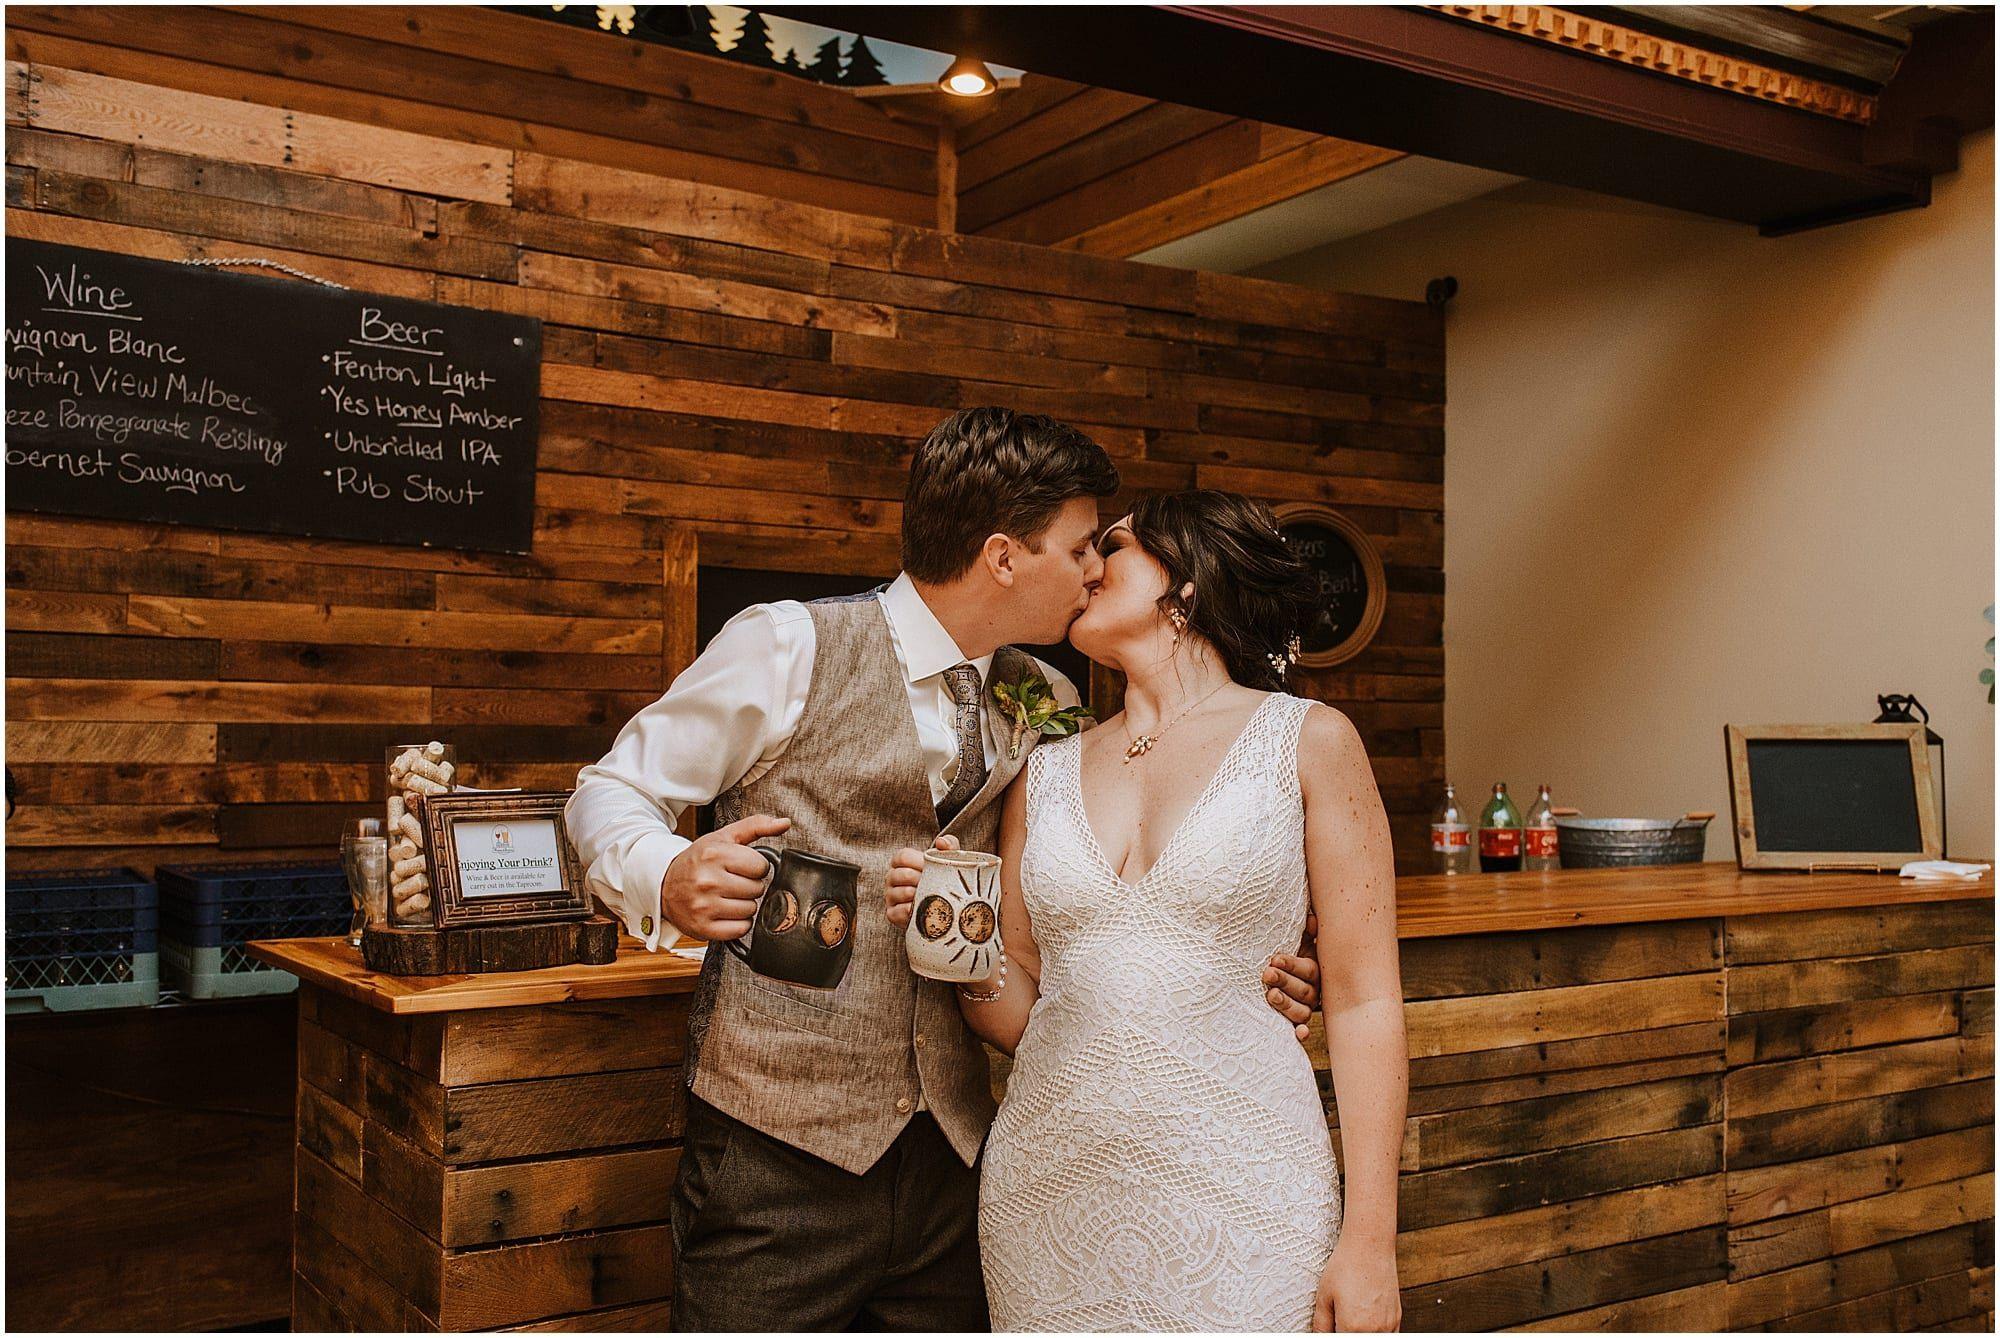 Summer Fenton Brewery Winery Wedding in 2020 Michigan